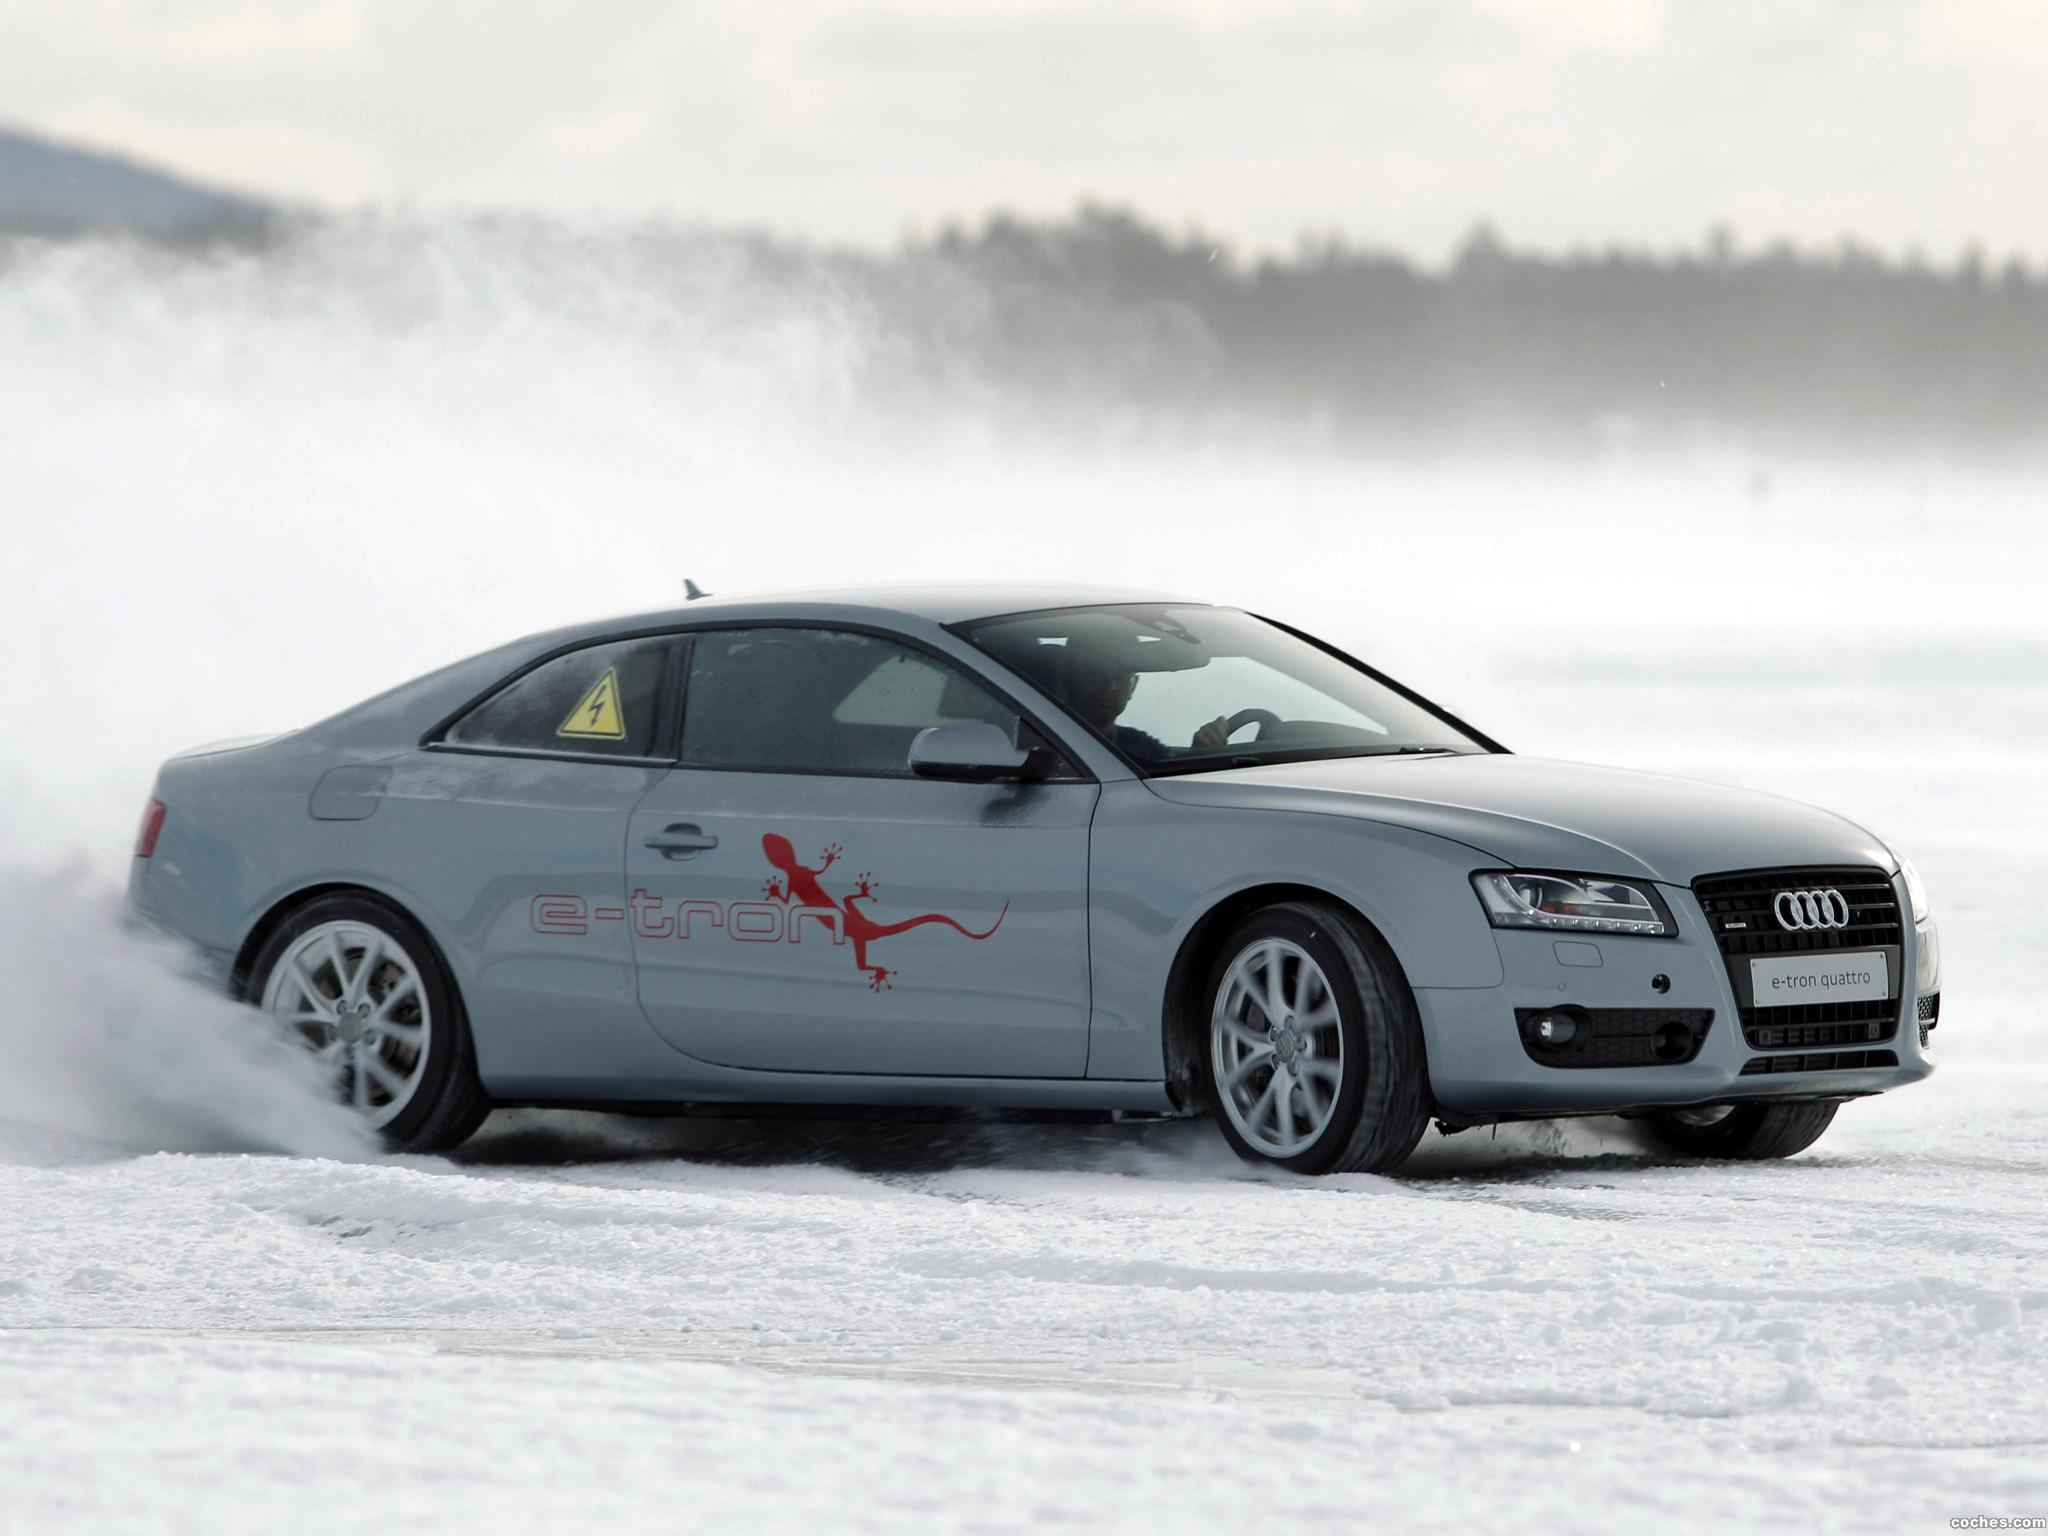 Foto 2 de Audi A5 e-tron Quattro Coupe 2011